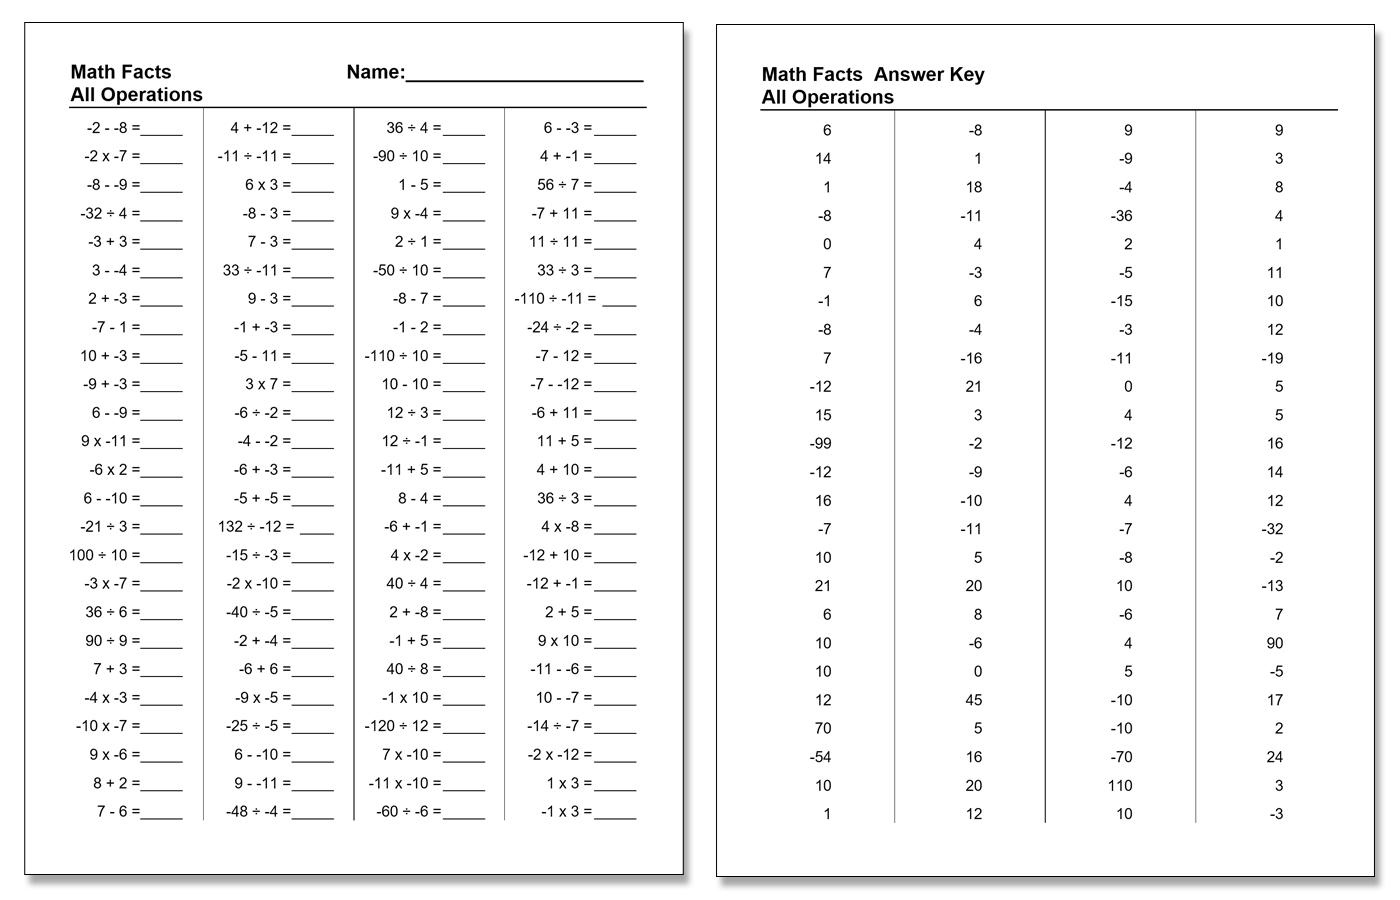 Worksheet Examples Math Facts Worksheet Generator